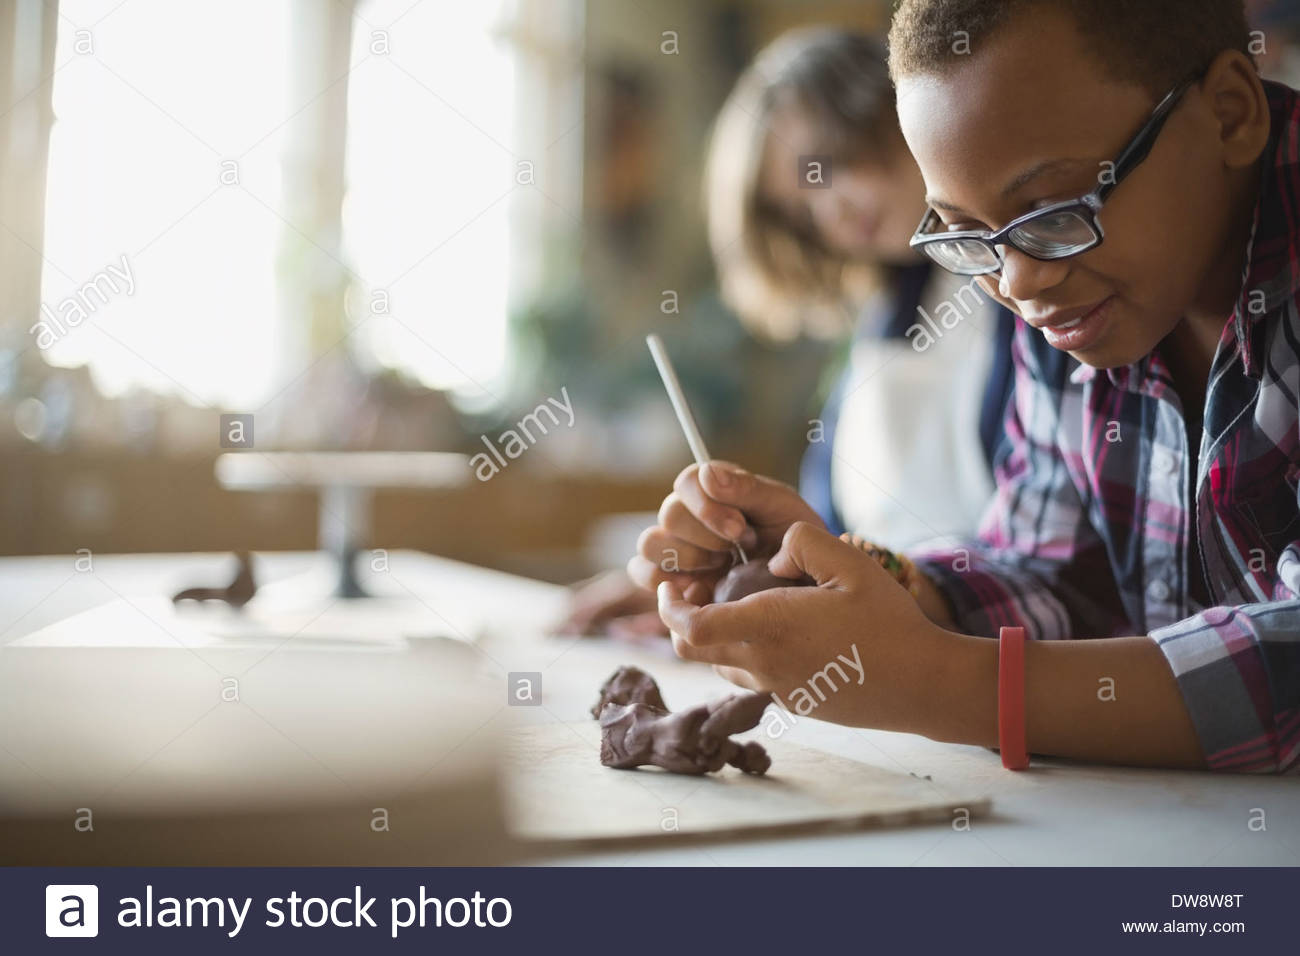 Ragazzo creazione di statuine di argilla in classe d'arte Immagini Stock